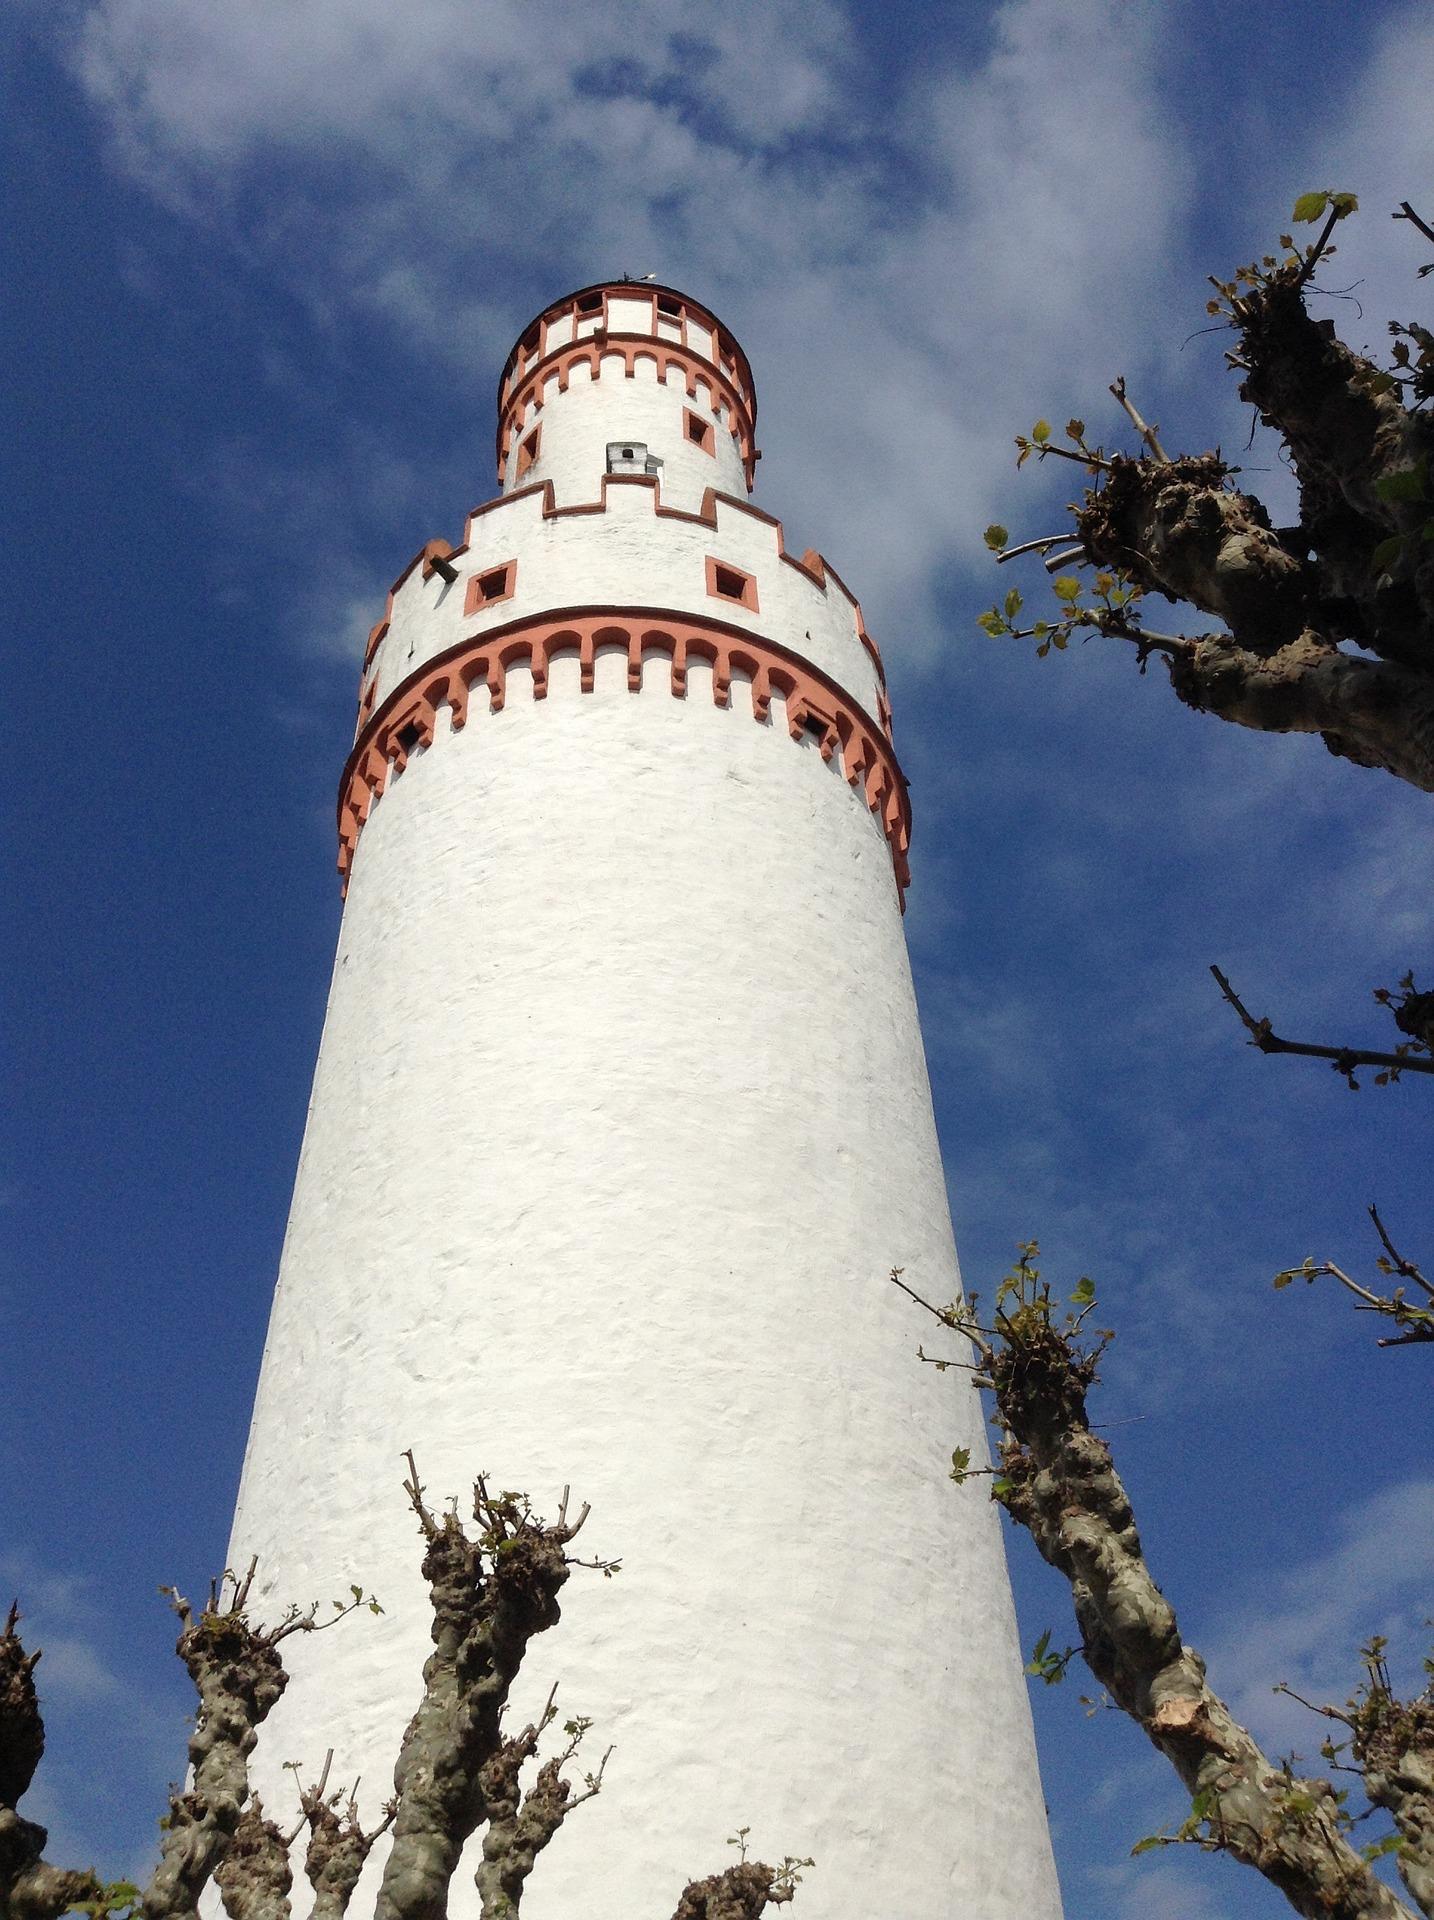 white-tower-751806_1920